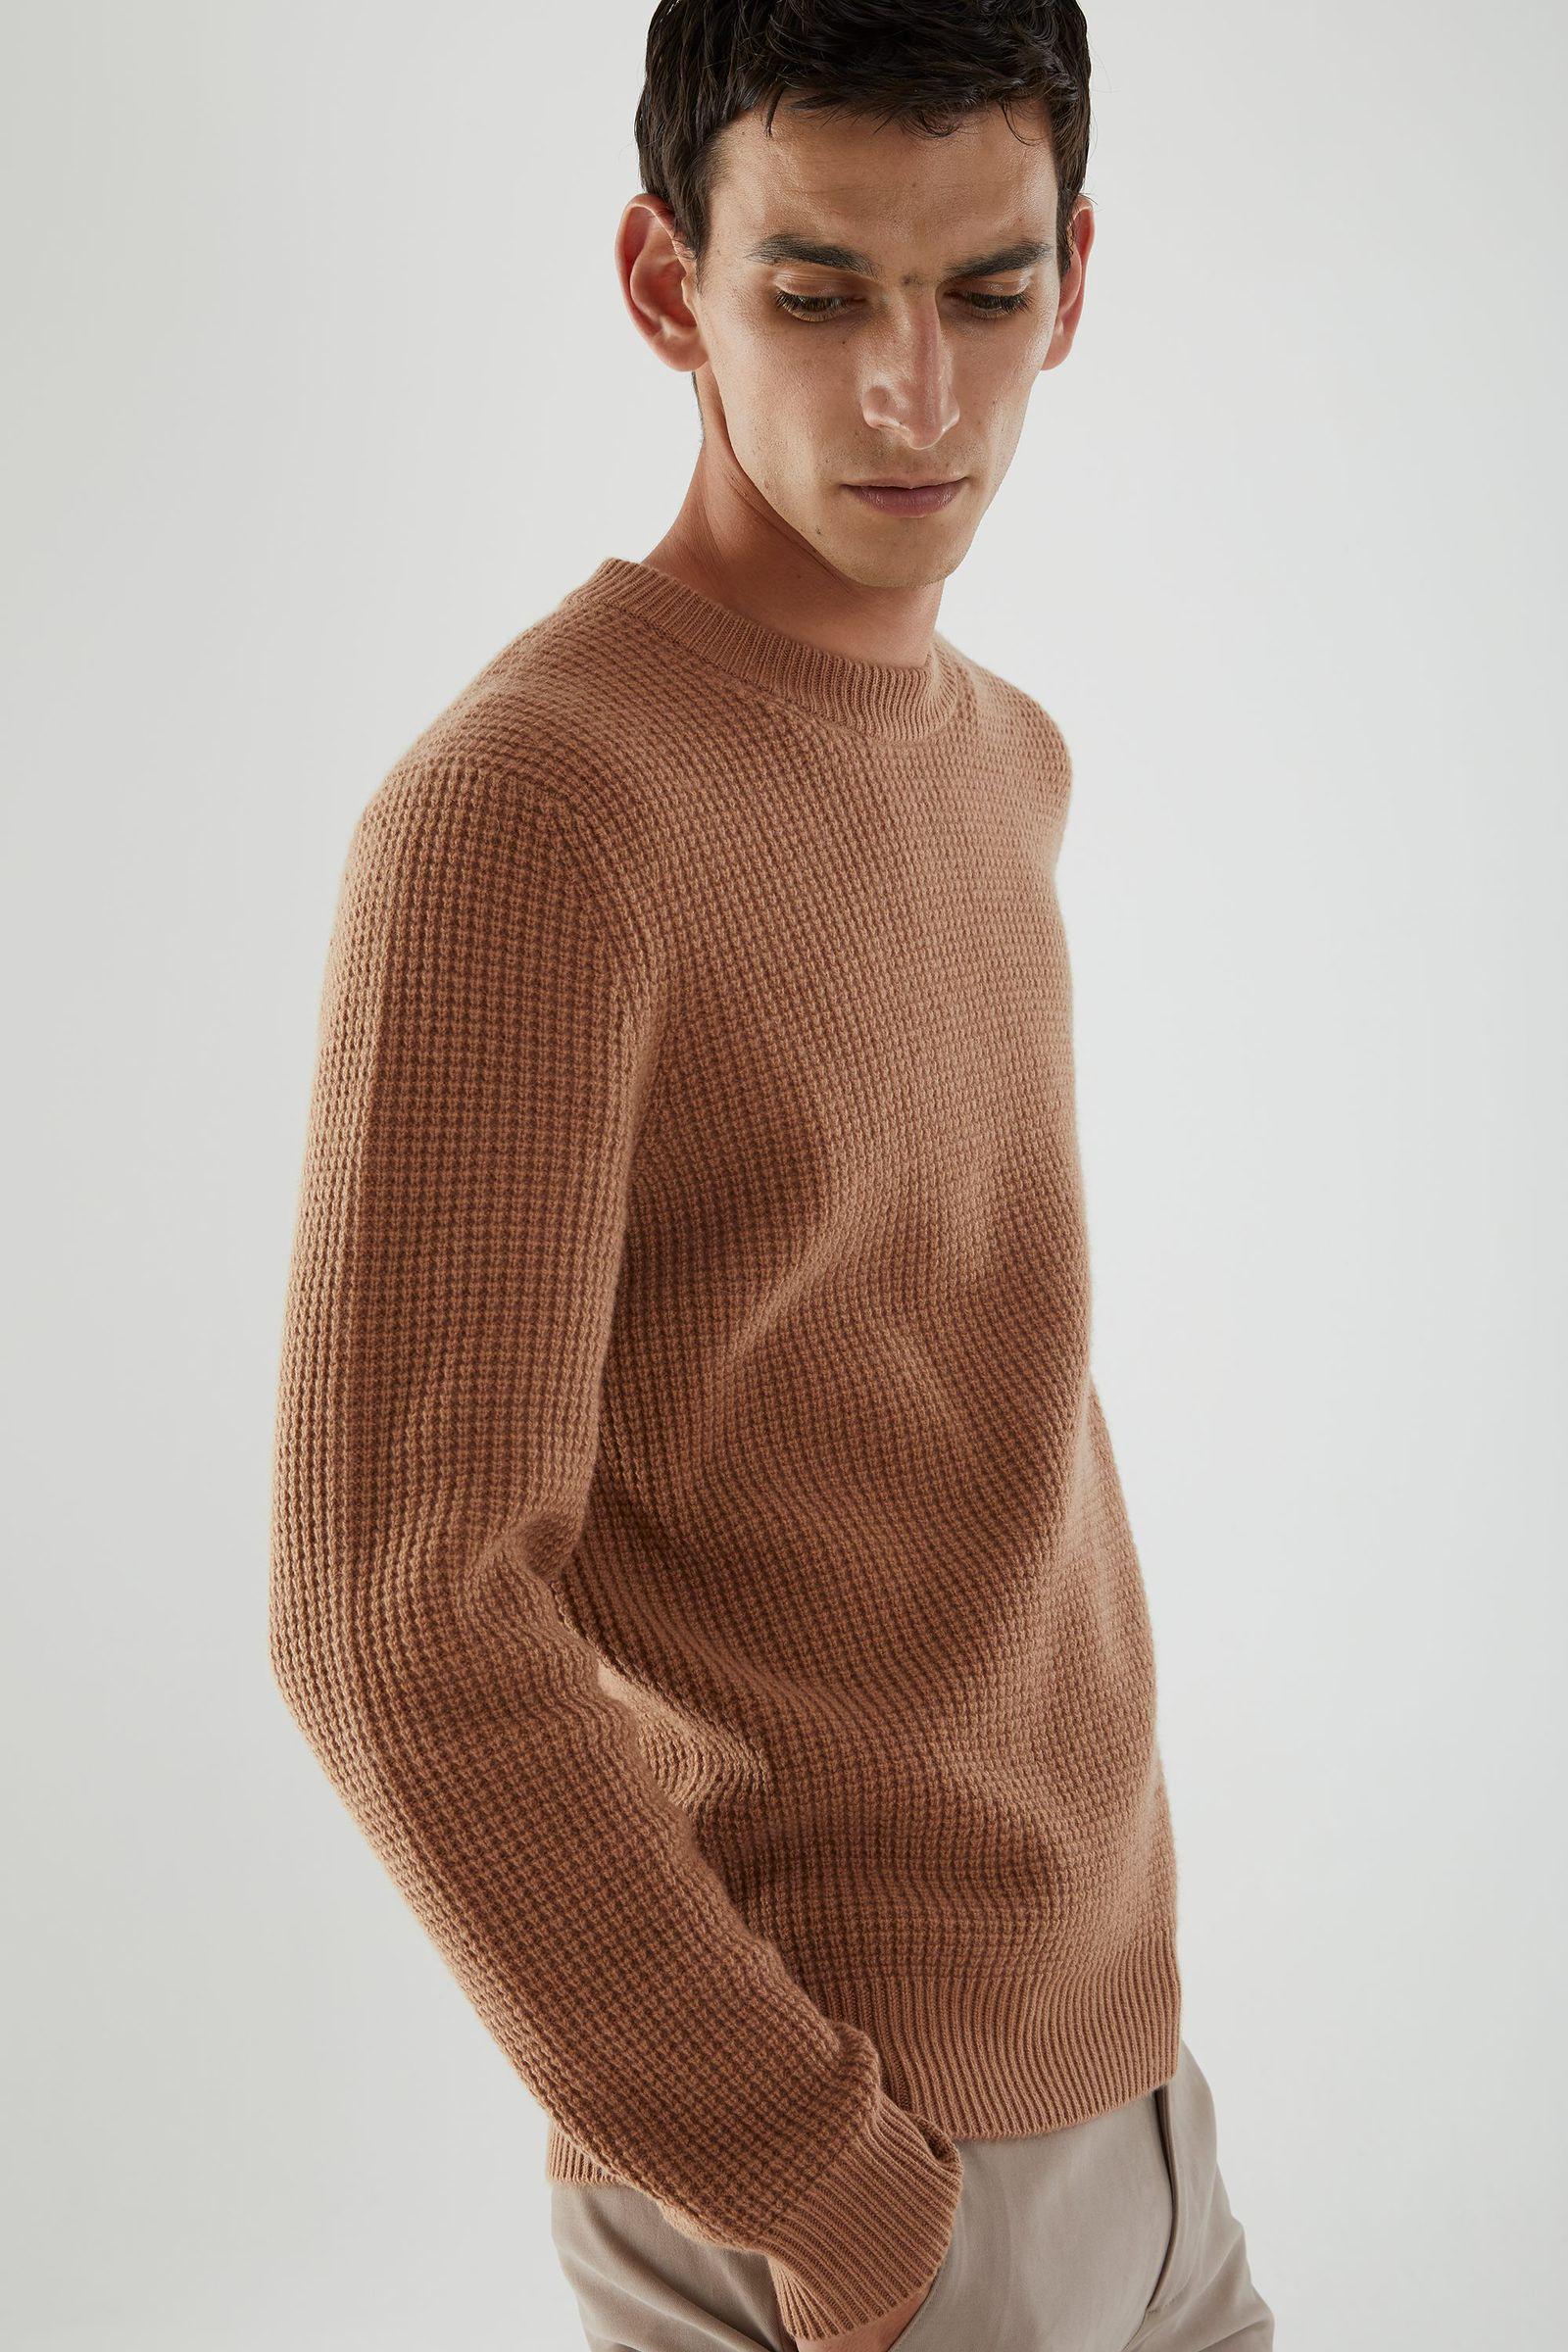 COS 캐시미어 와플 니트 스웨터의 베이지컬러 ECOMLook입니다.